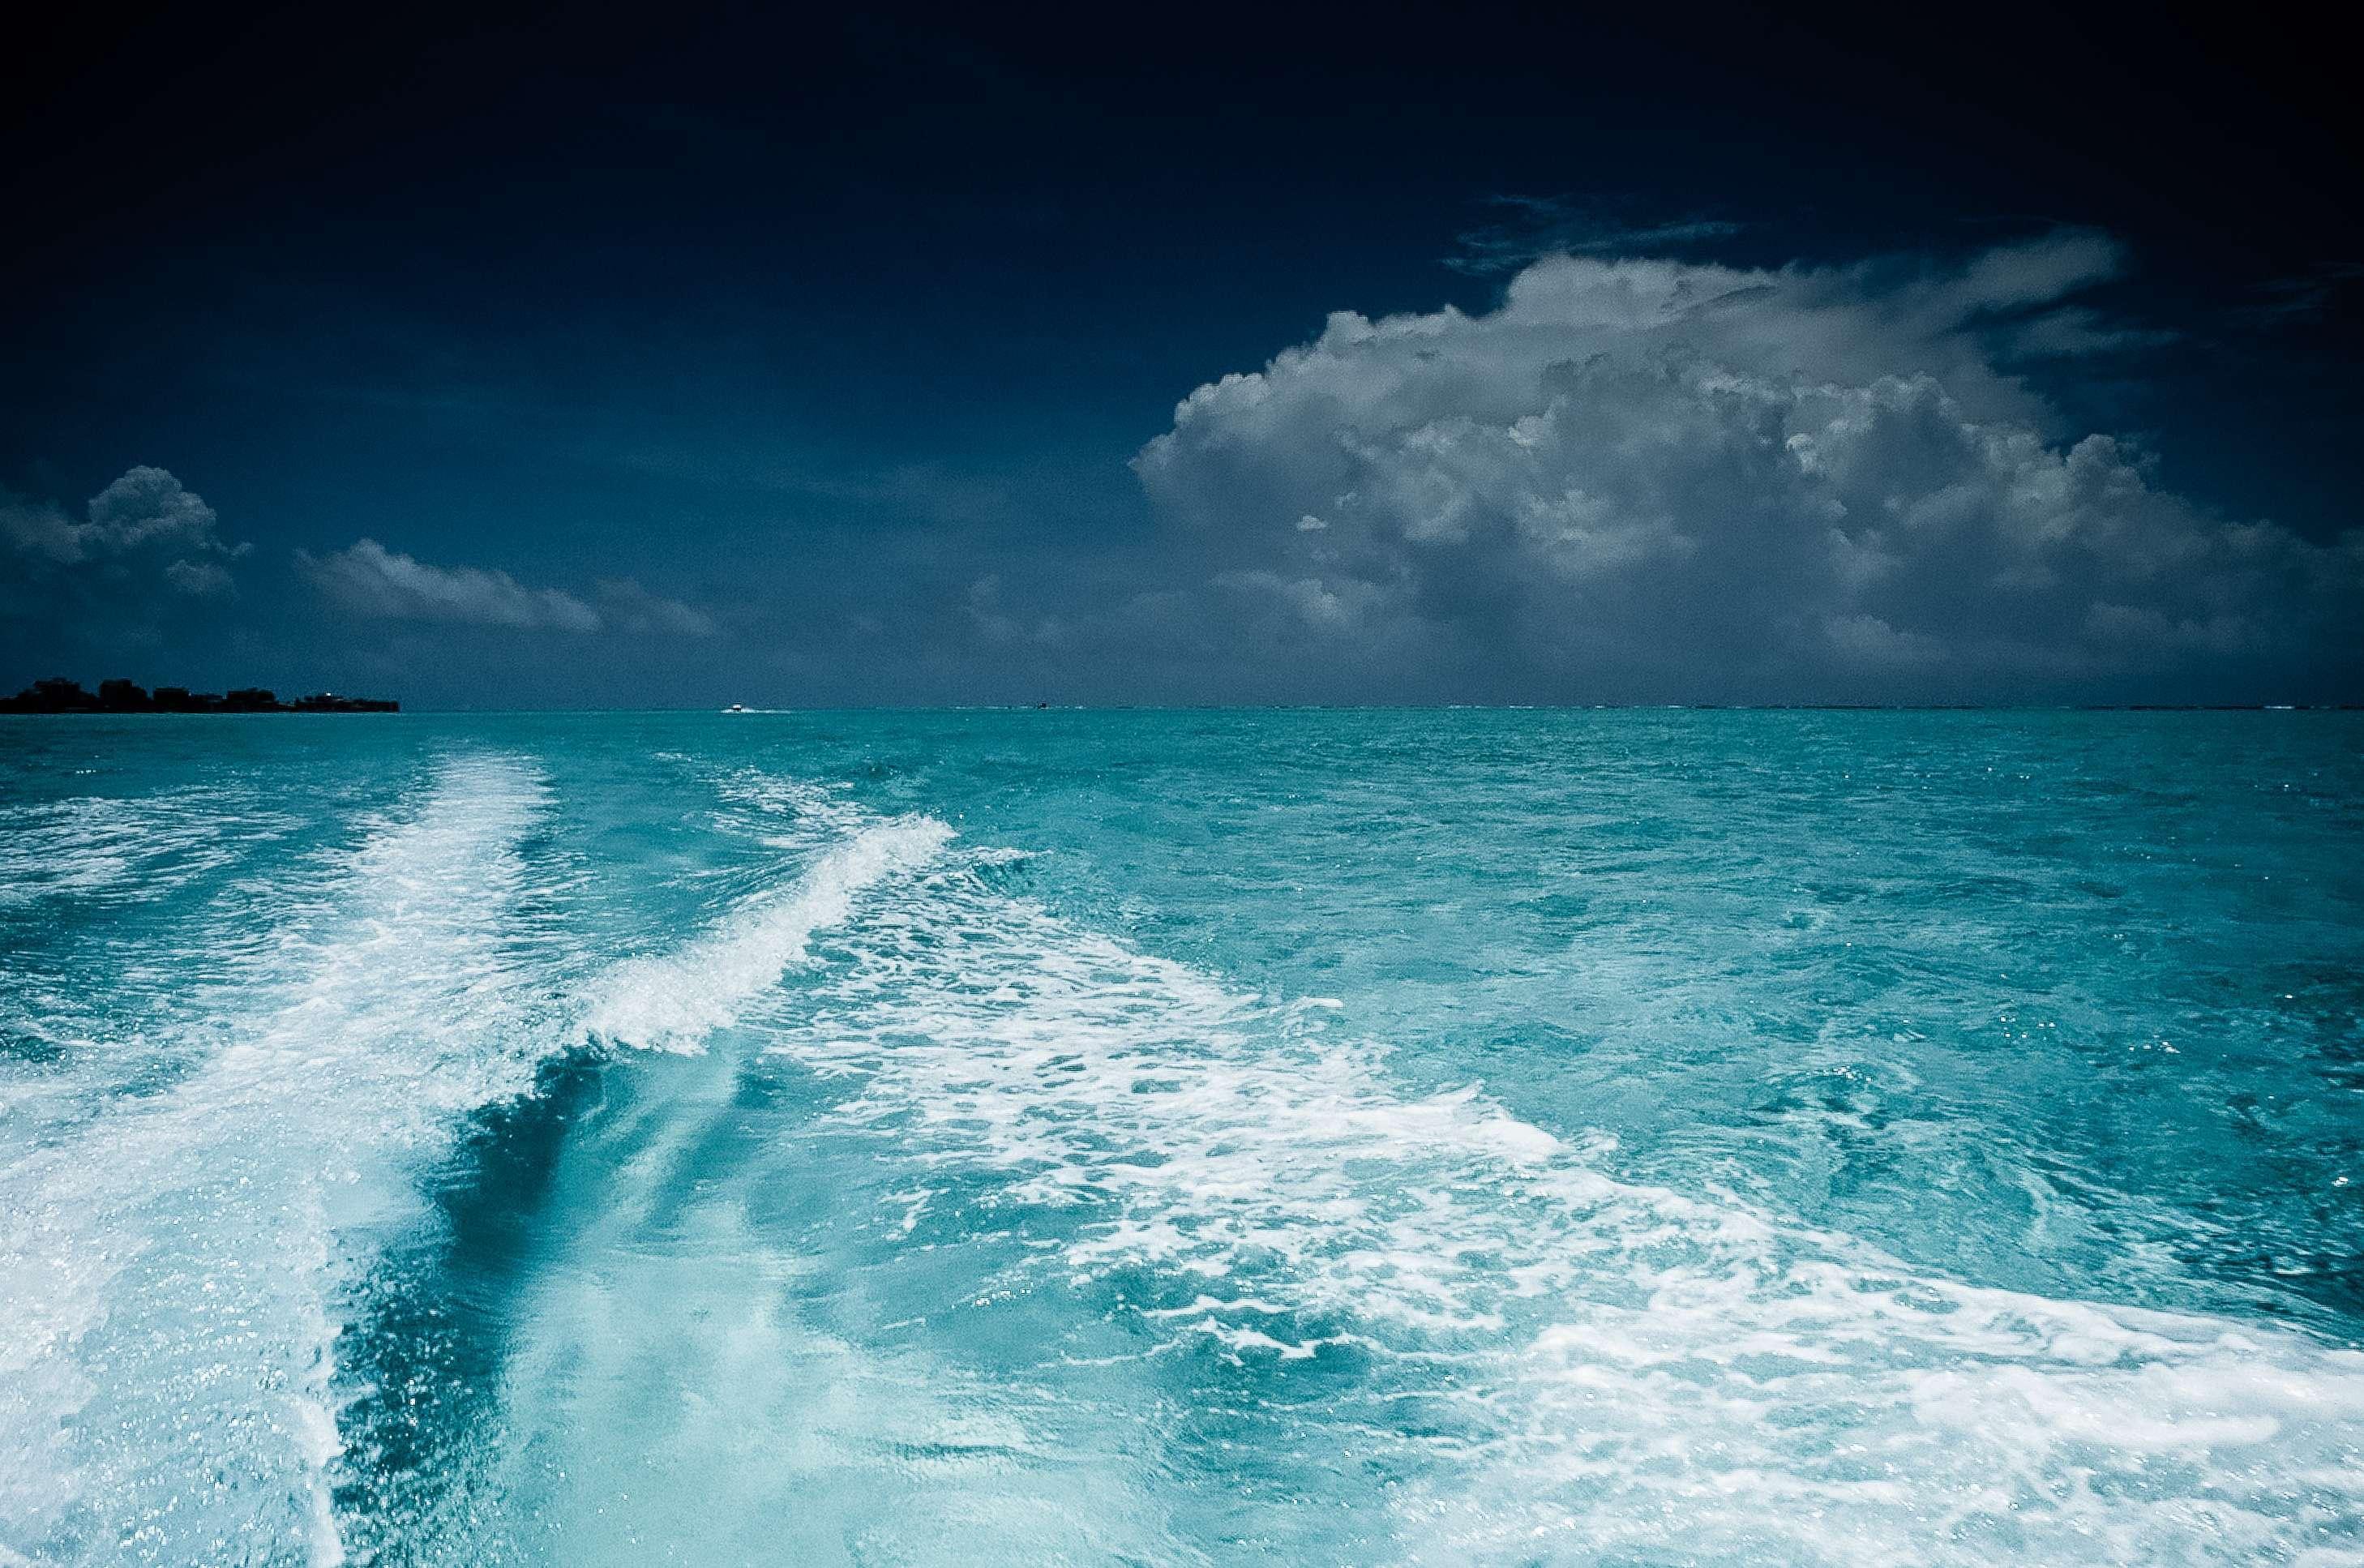 WAVES-ISLA-SANANDRES @ Photo Copy MrLukkor©